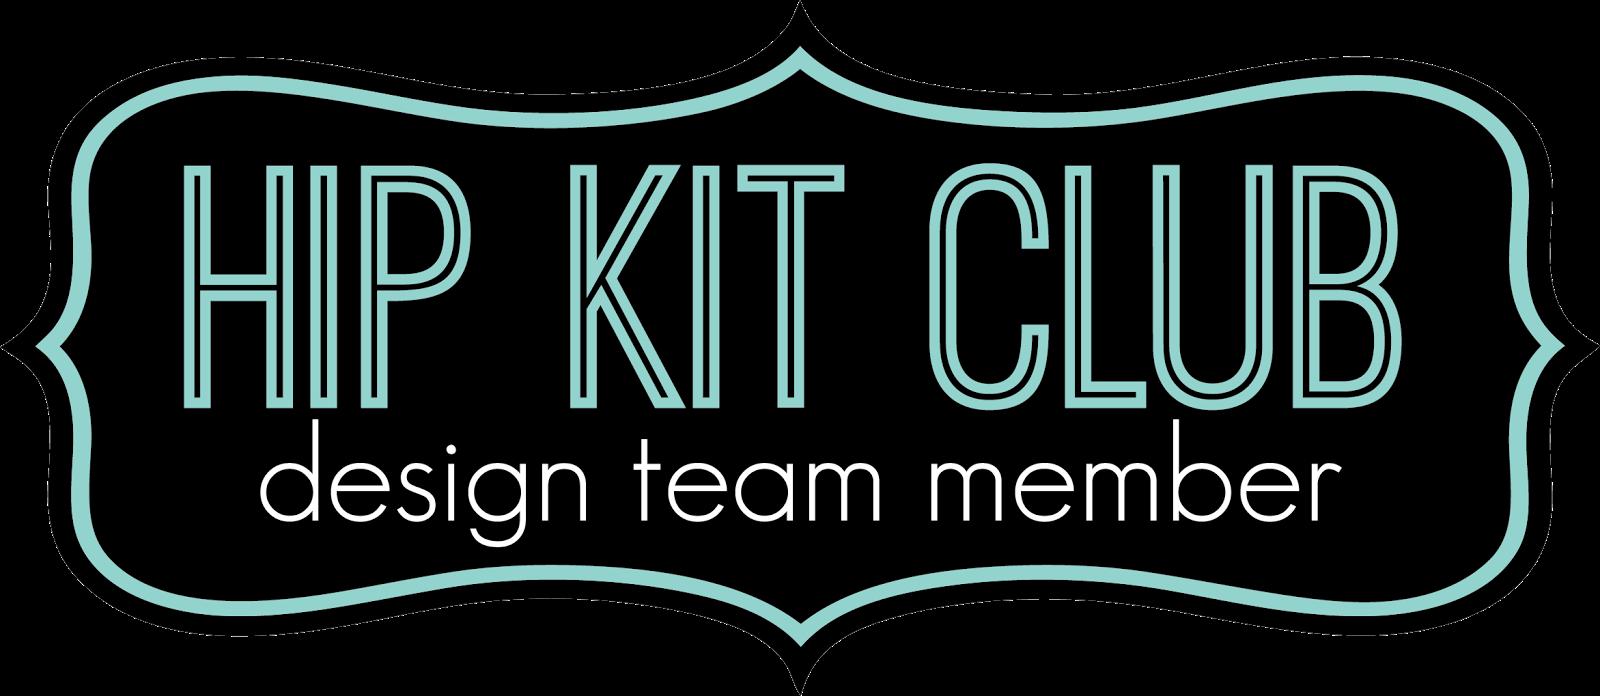 Former design team member...